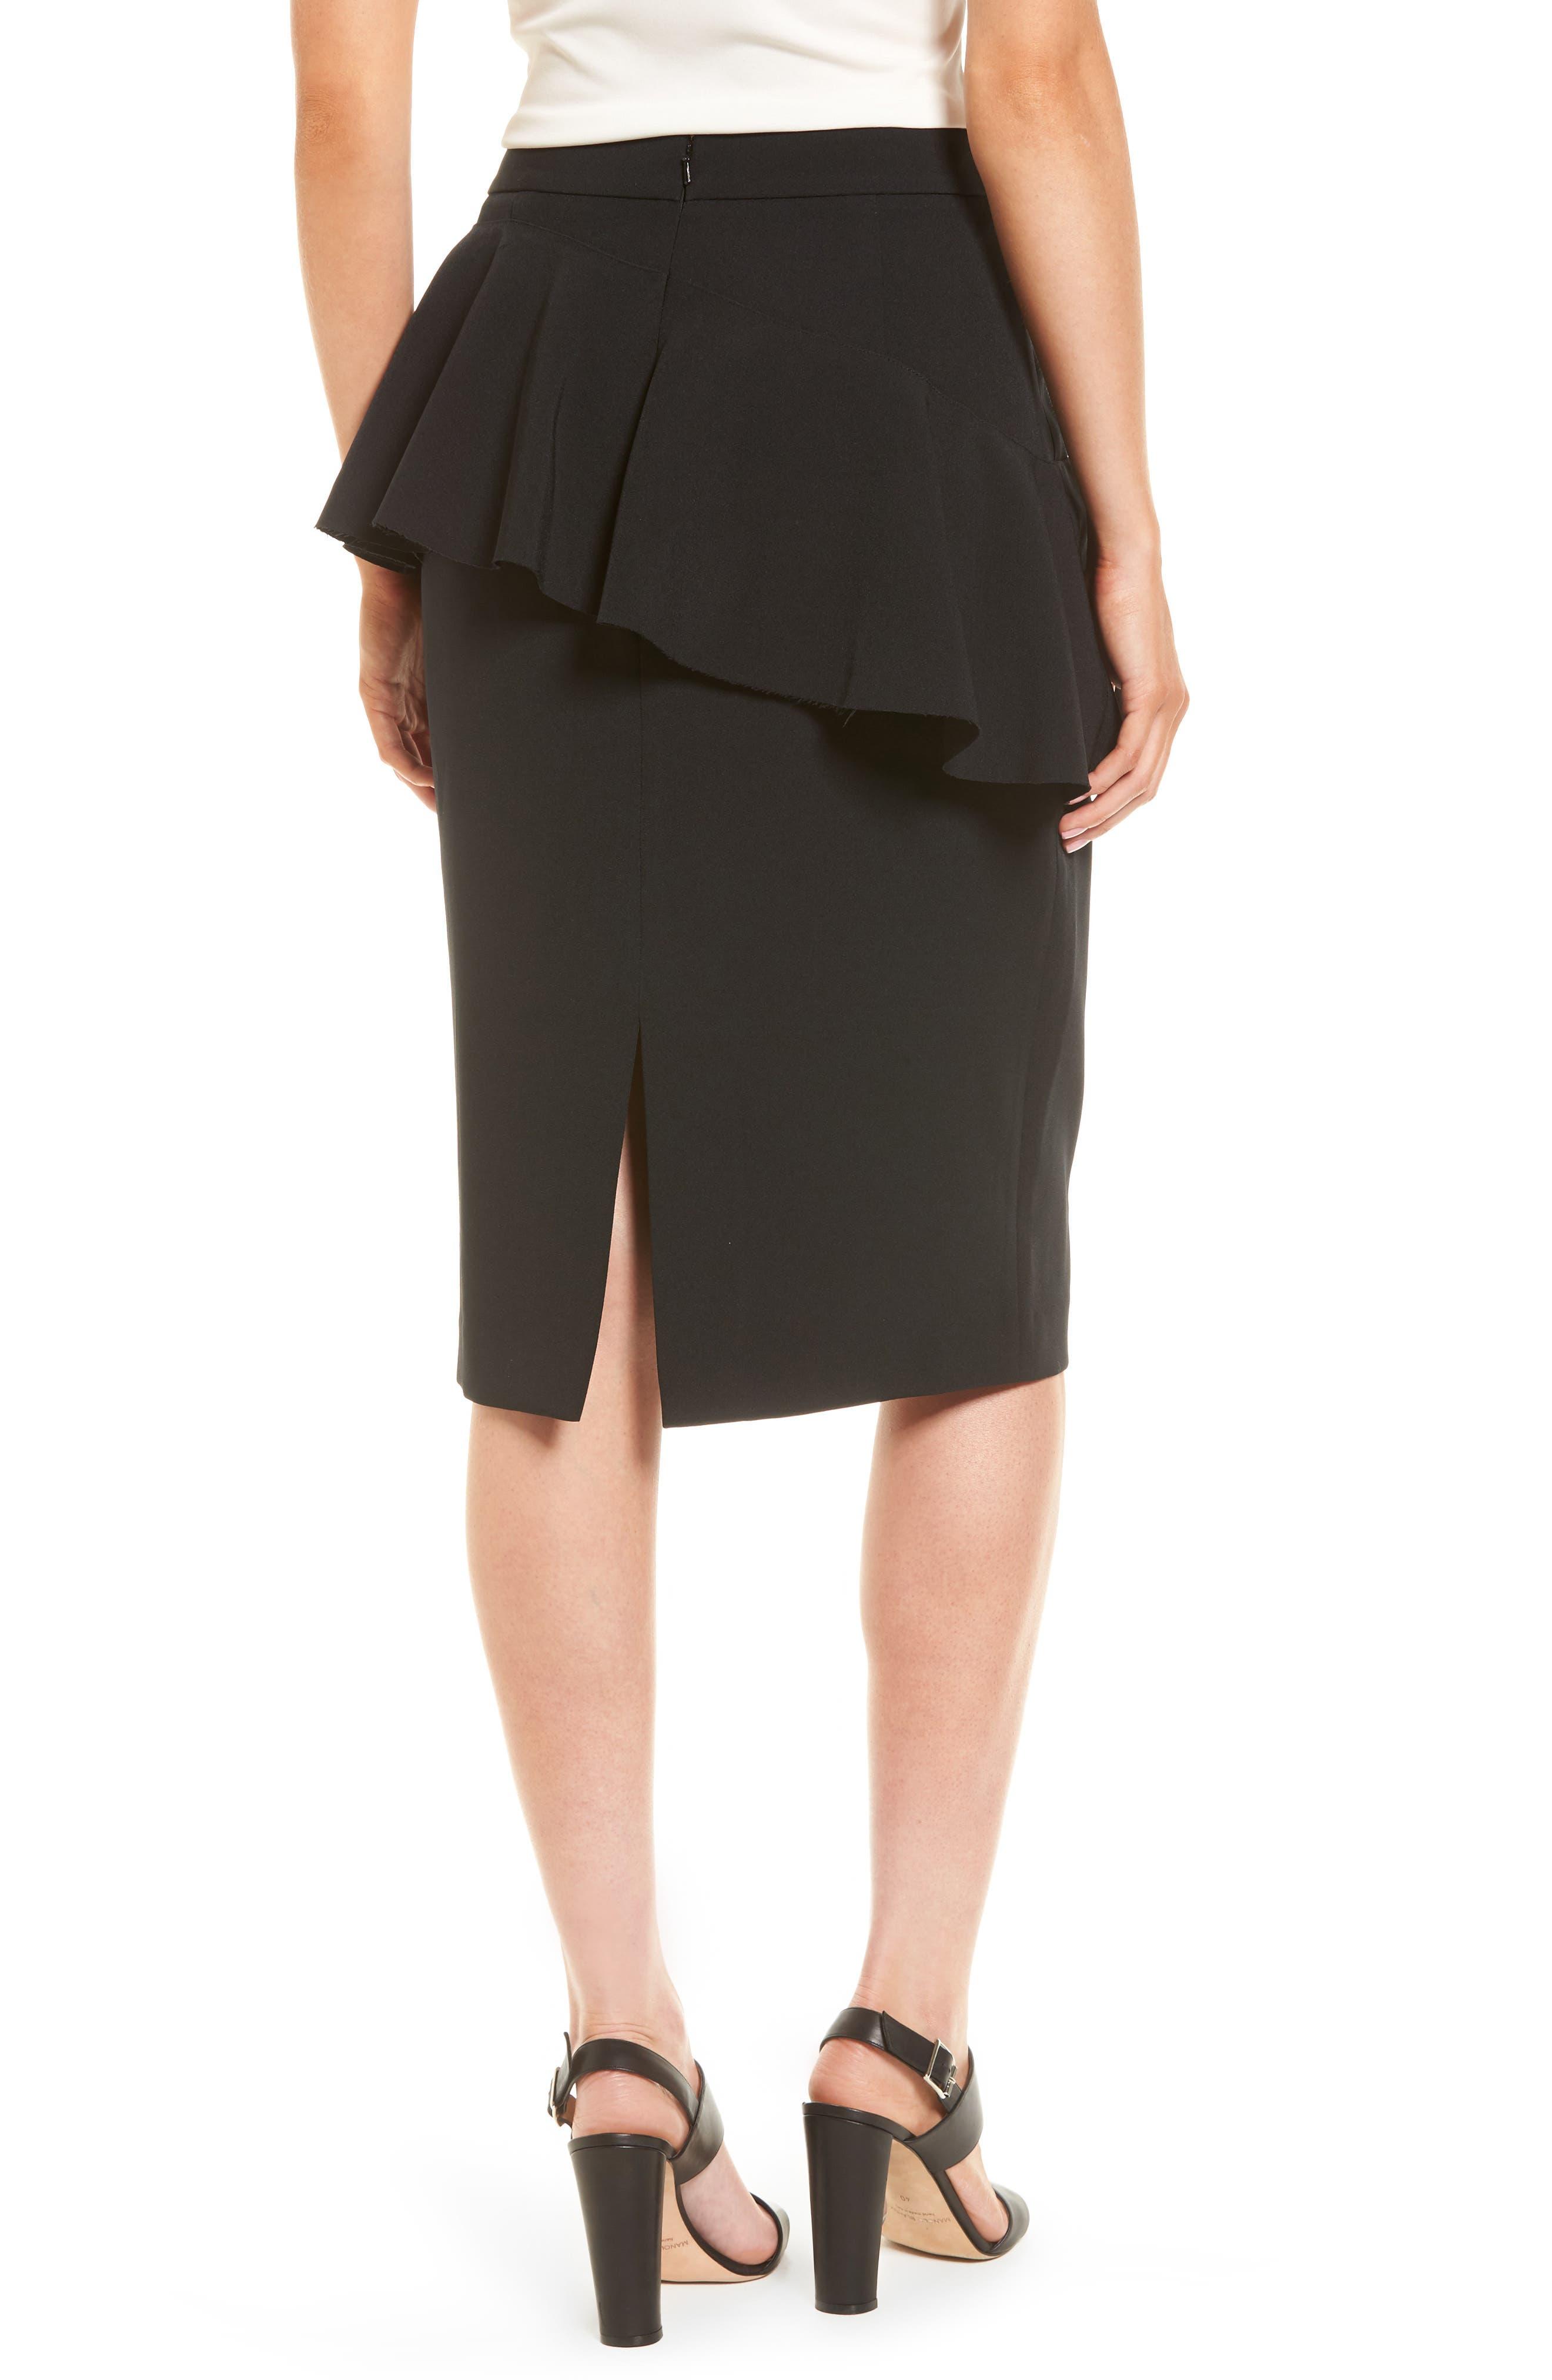 Ruffle Detail Pencil Skirt,                             Alternate thumbnail 2, color,                             001